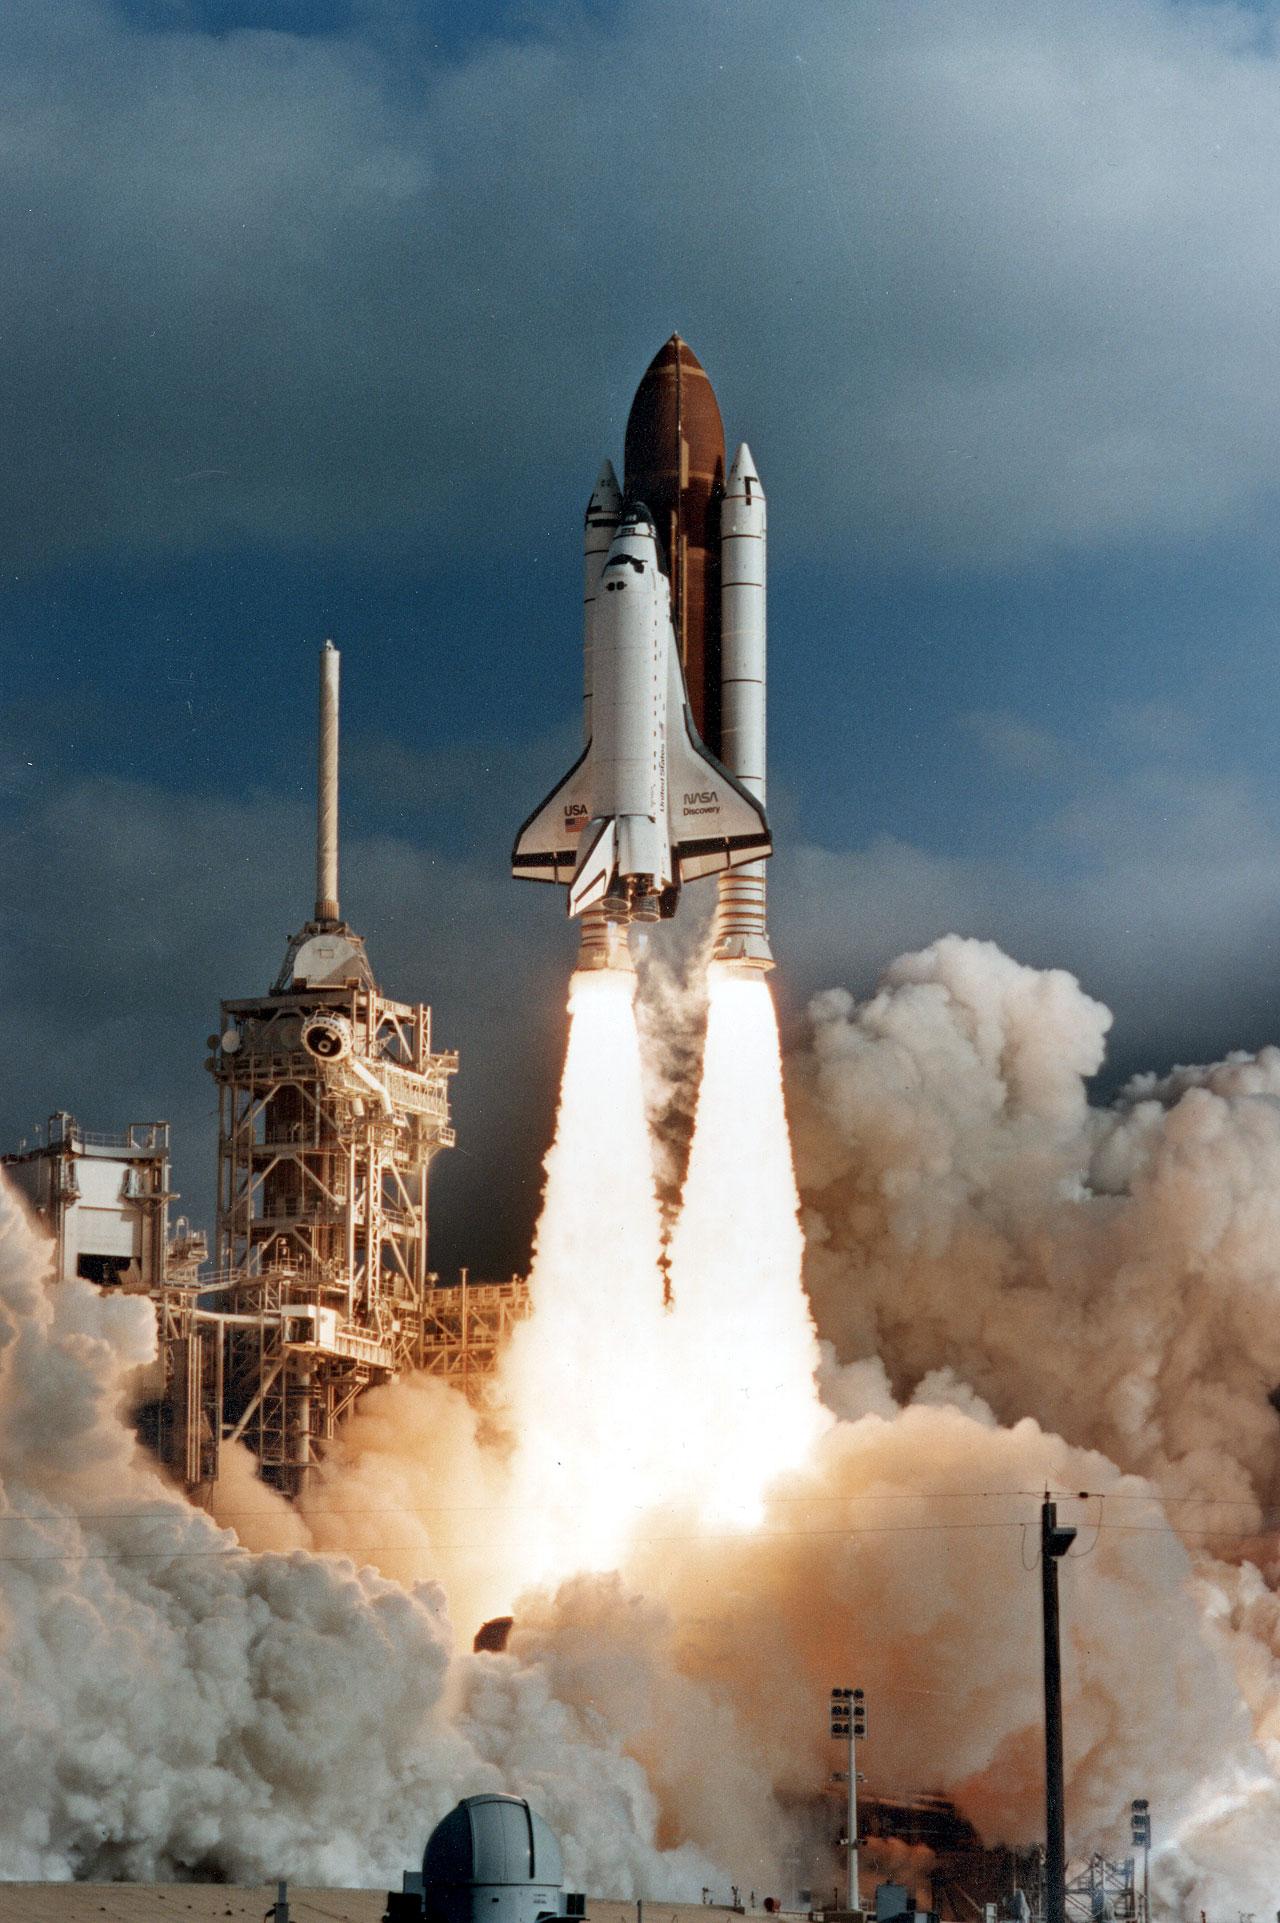 space shuttle hubble telescope - photo #28